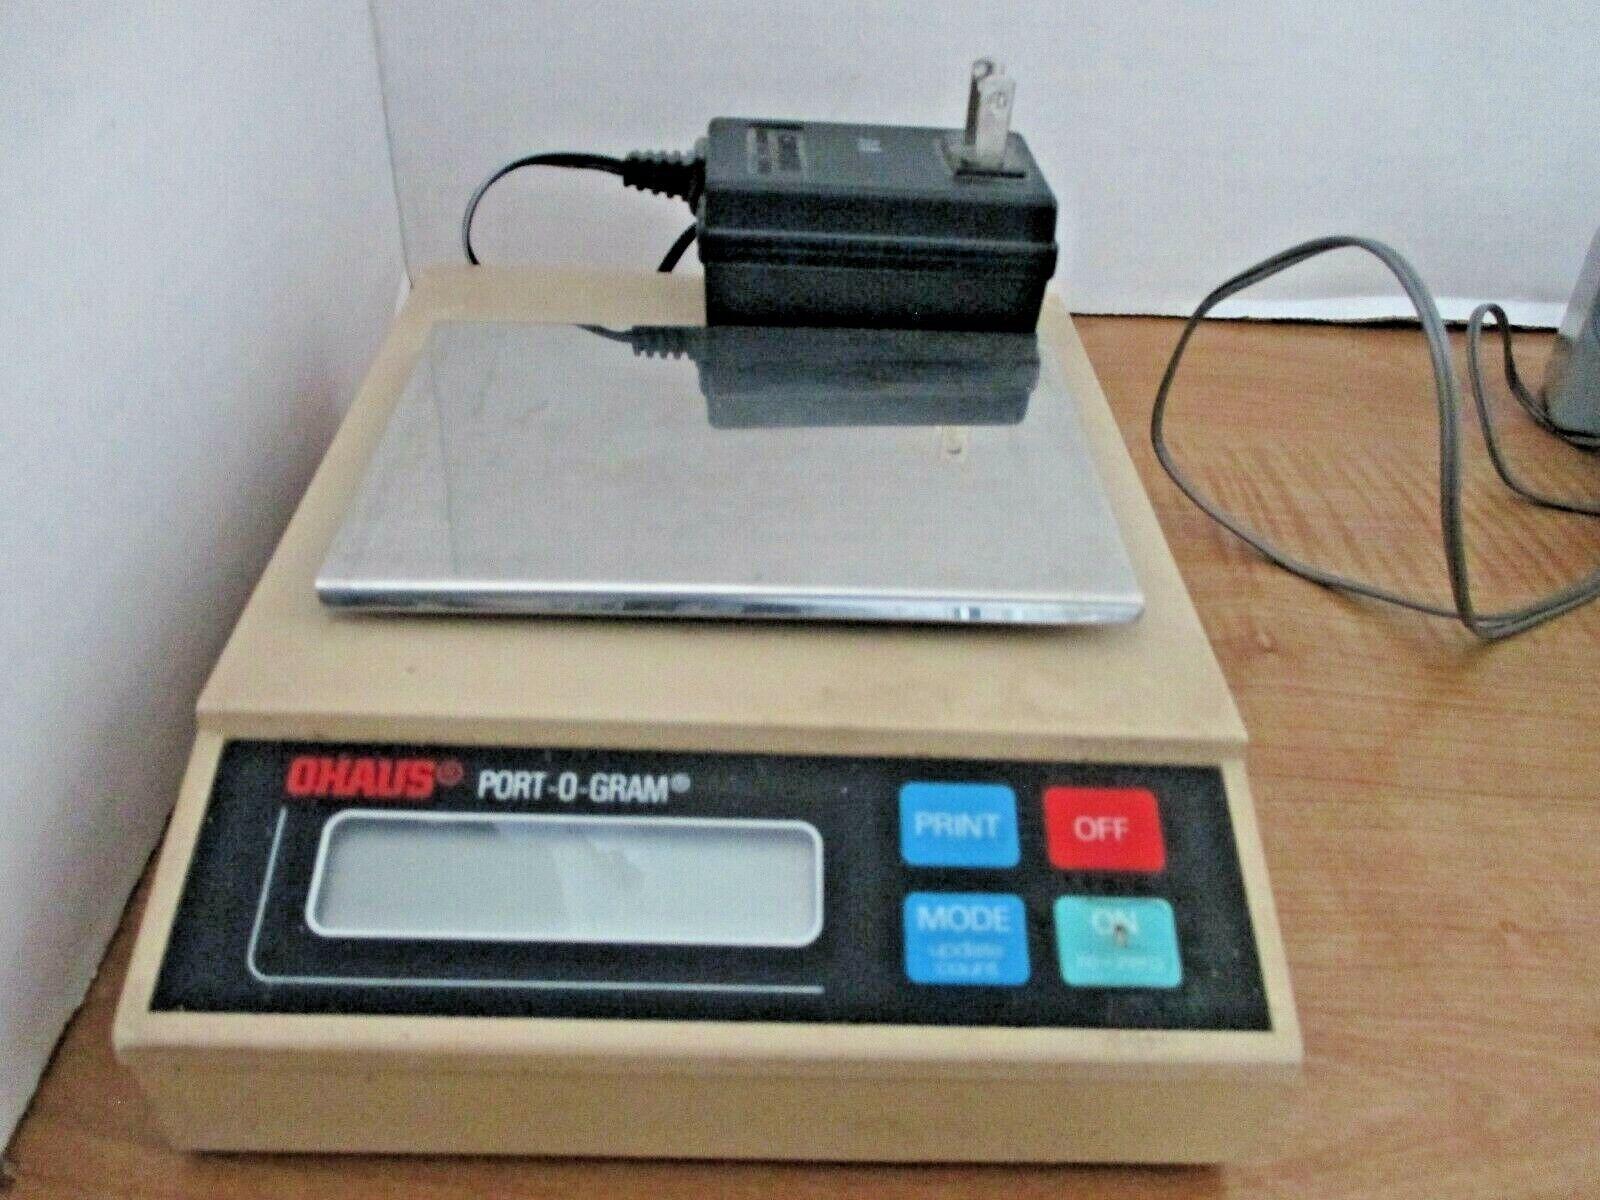 b61d933fd77c Ohaus Port-o-gram 300g Digital Scale Model C301P Working